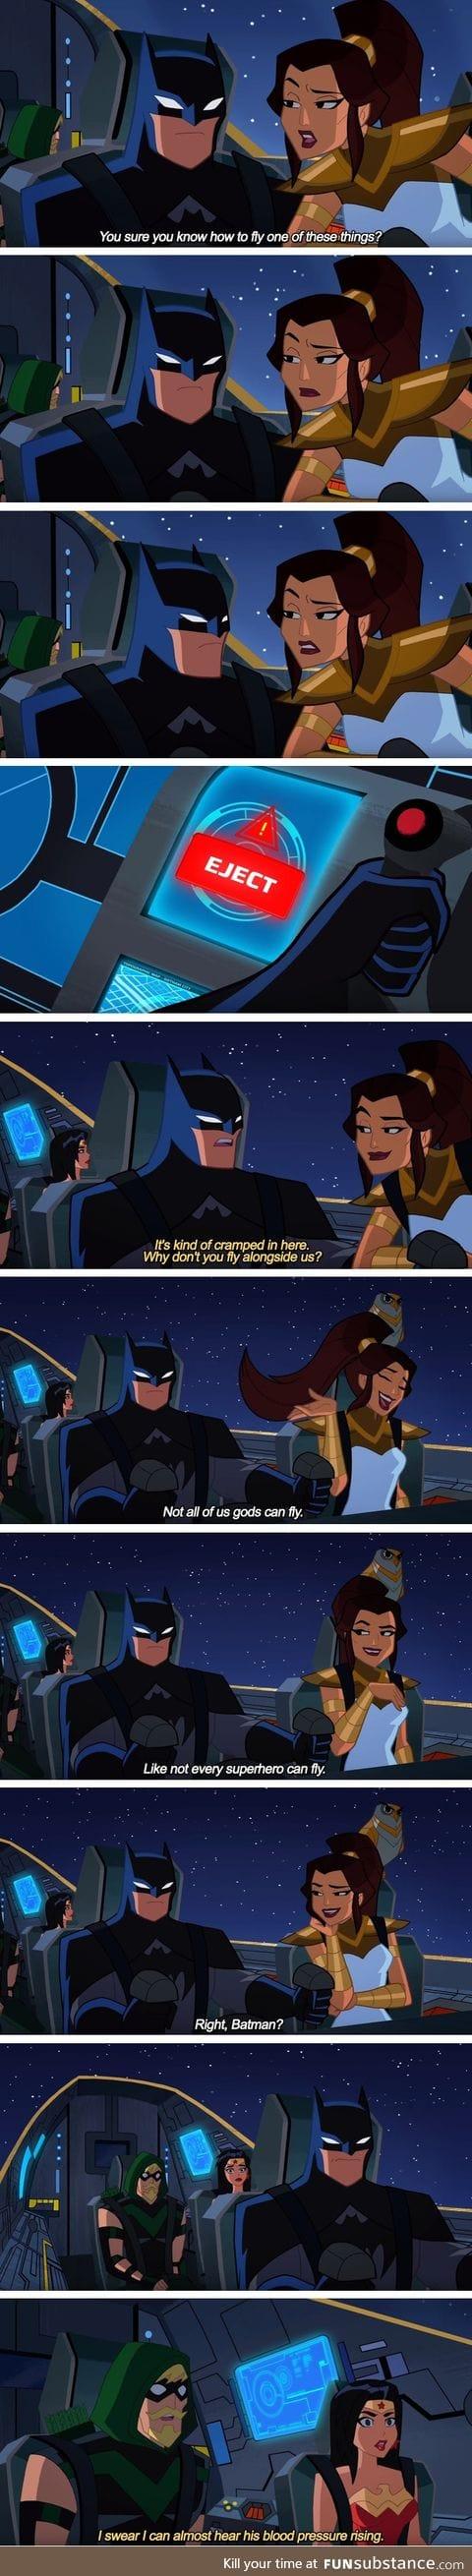 Don't piss off the bat